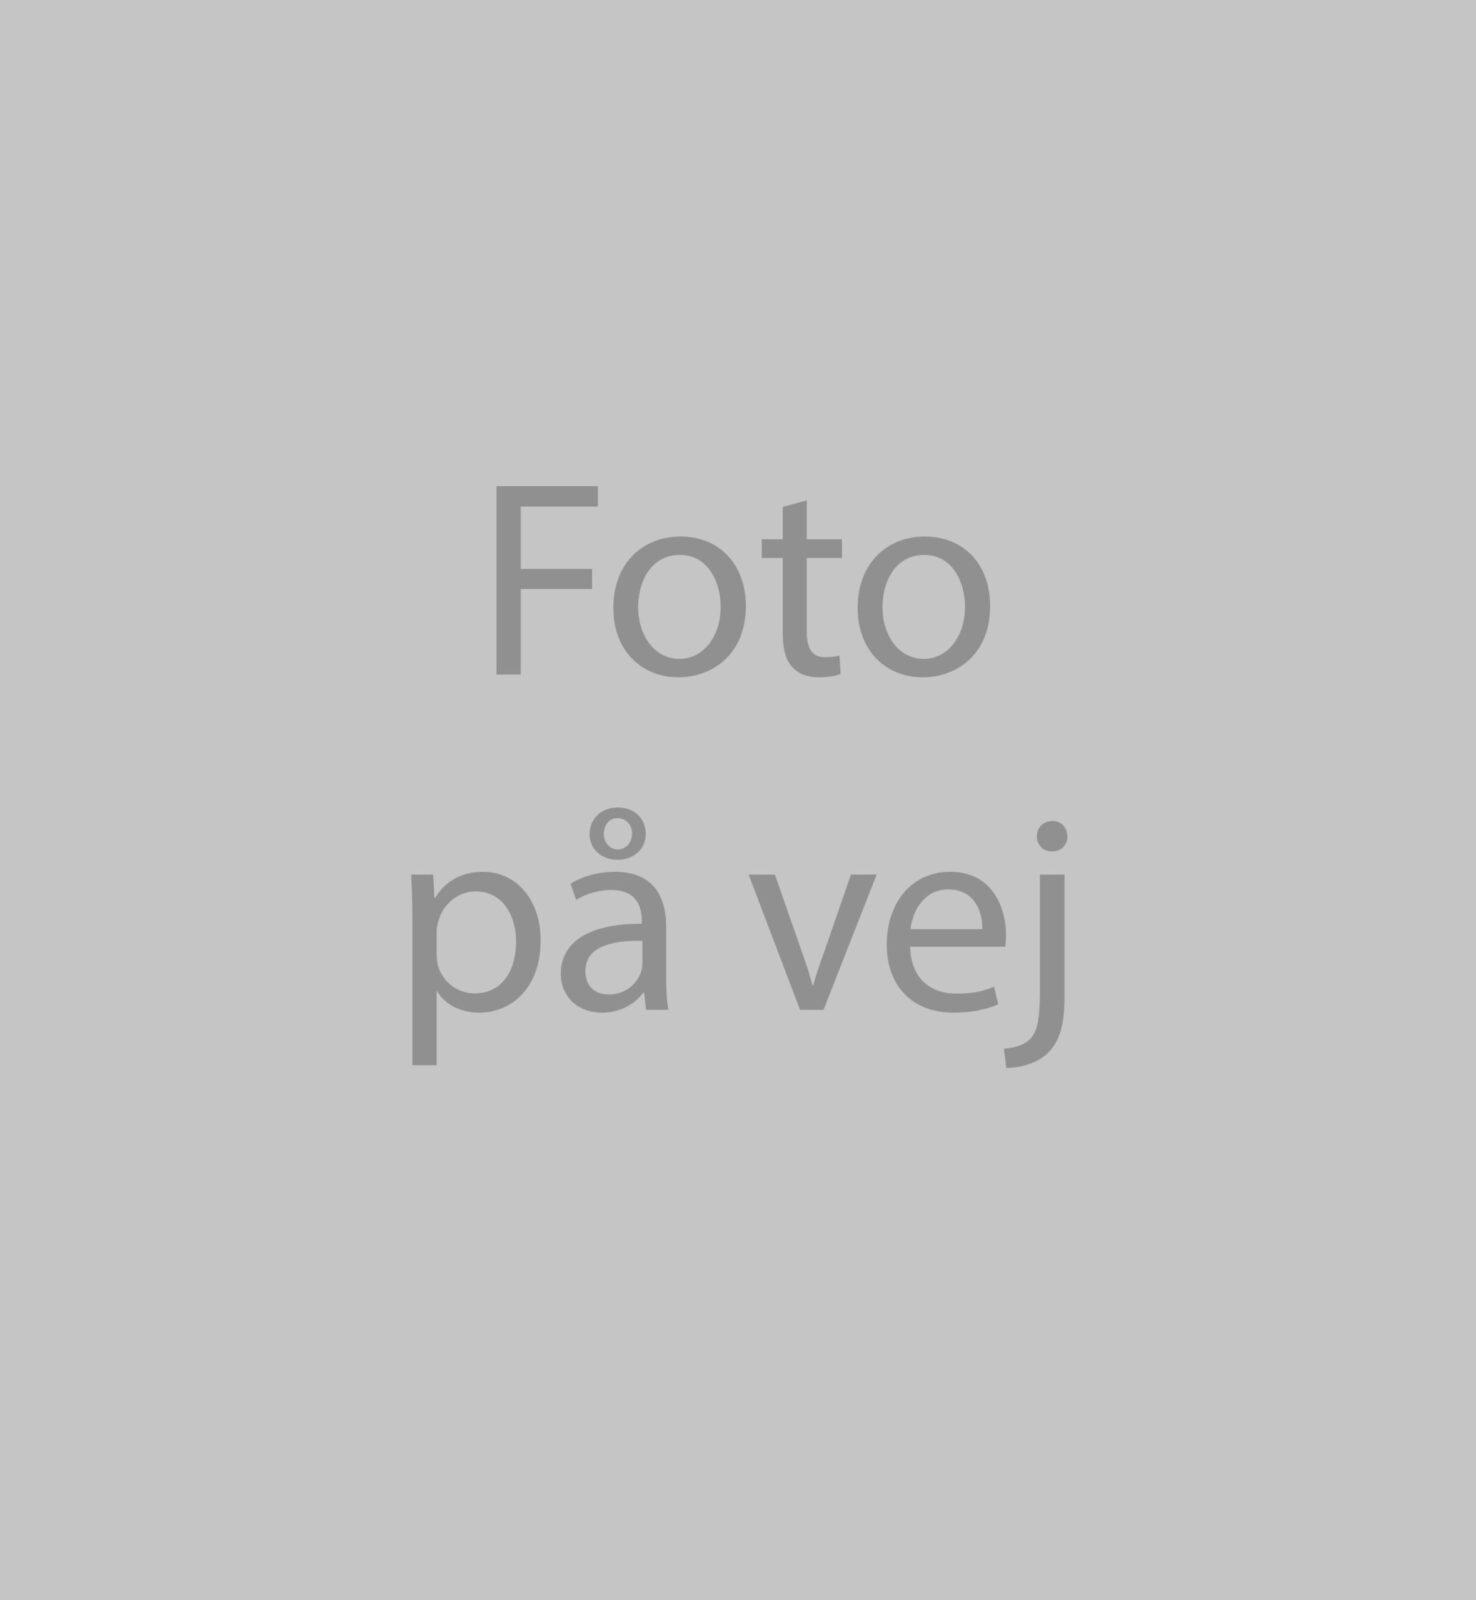 vexa-fotopaavej